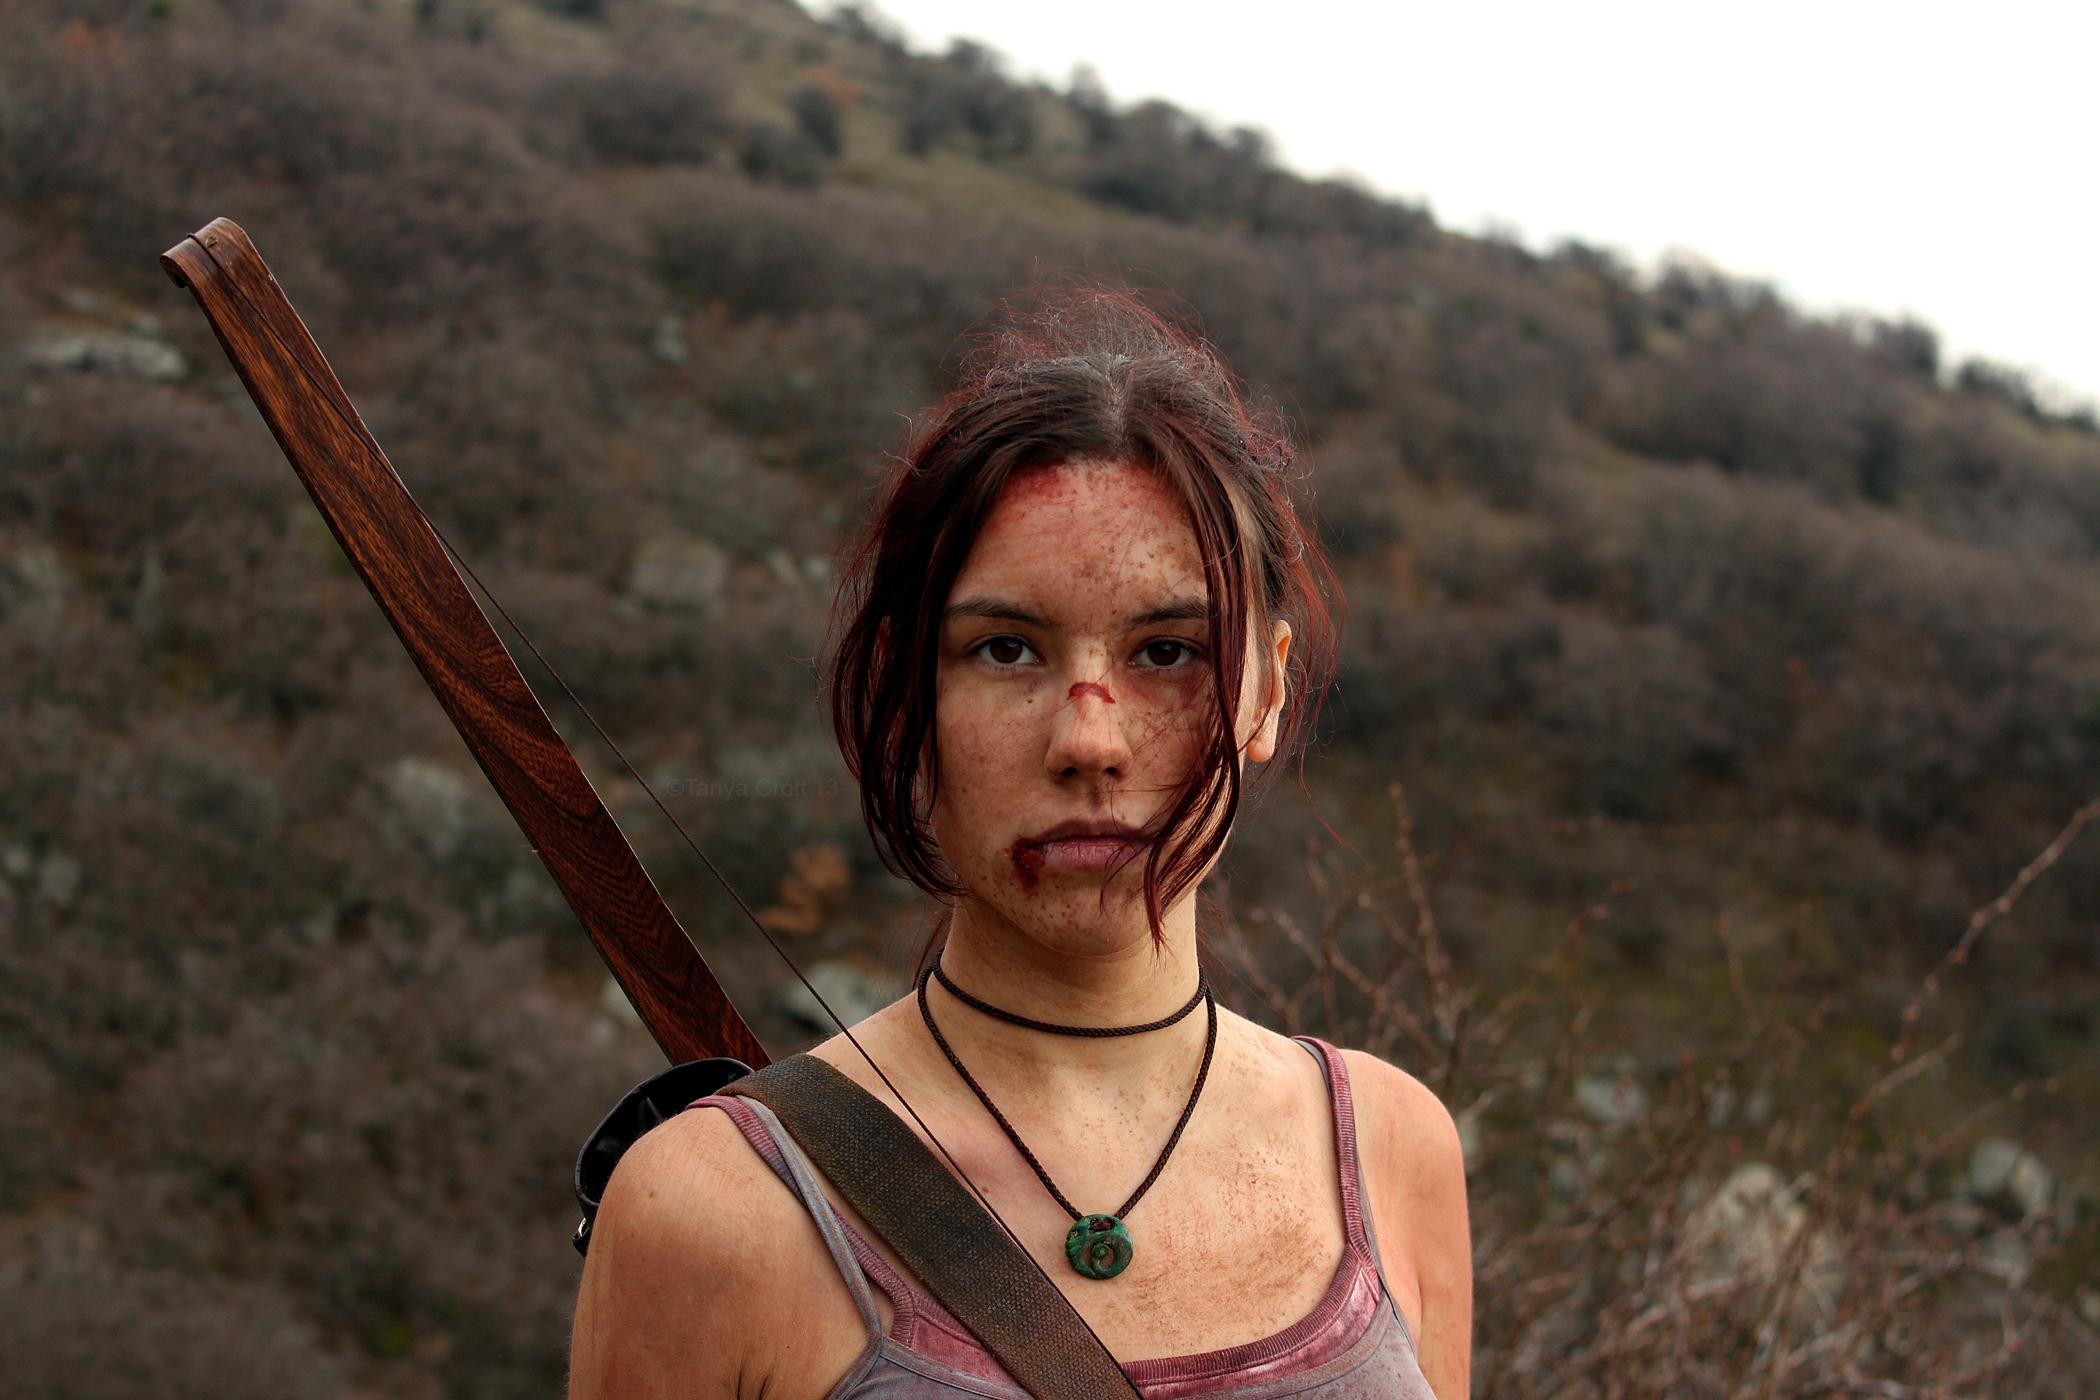 Lara croftгђђnude mod hentai clip